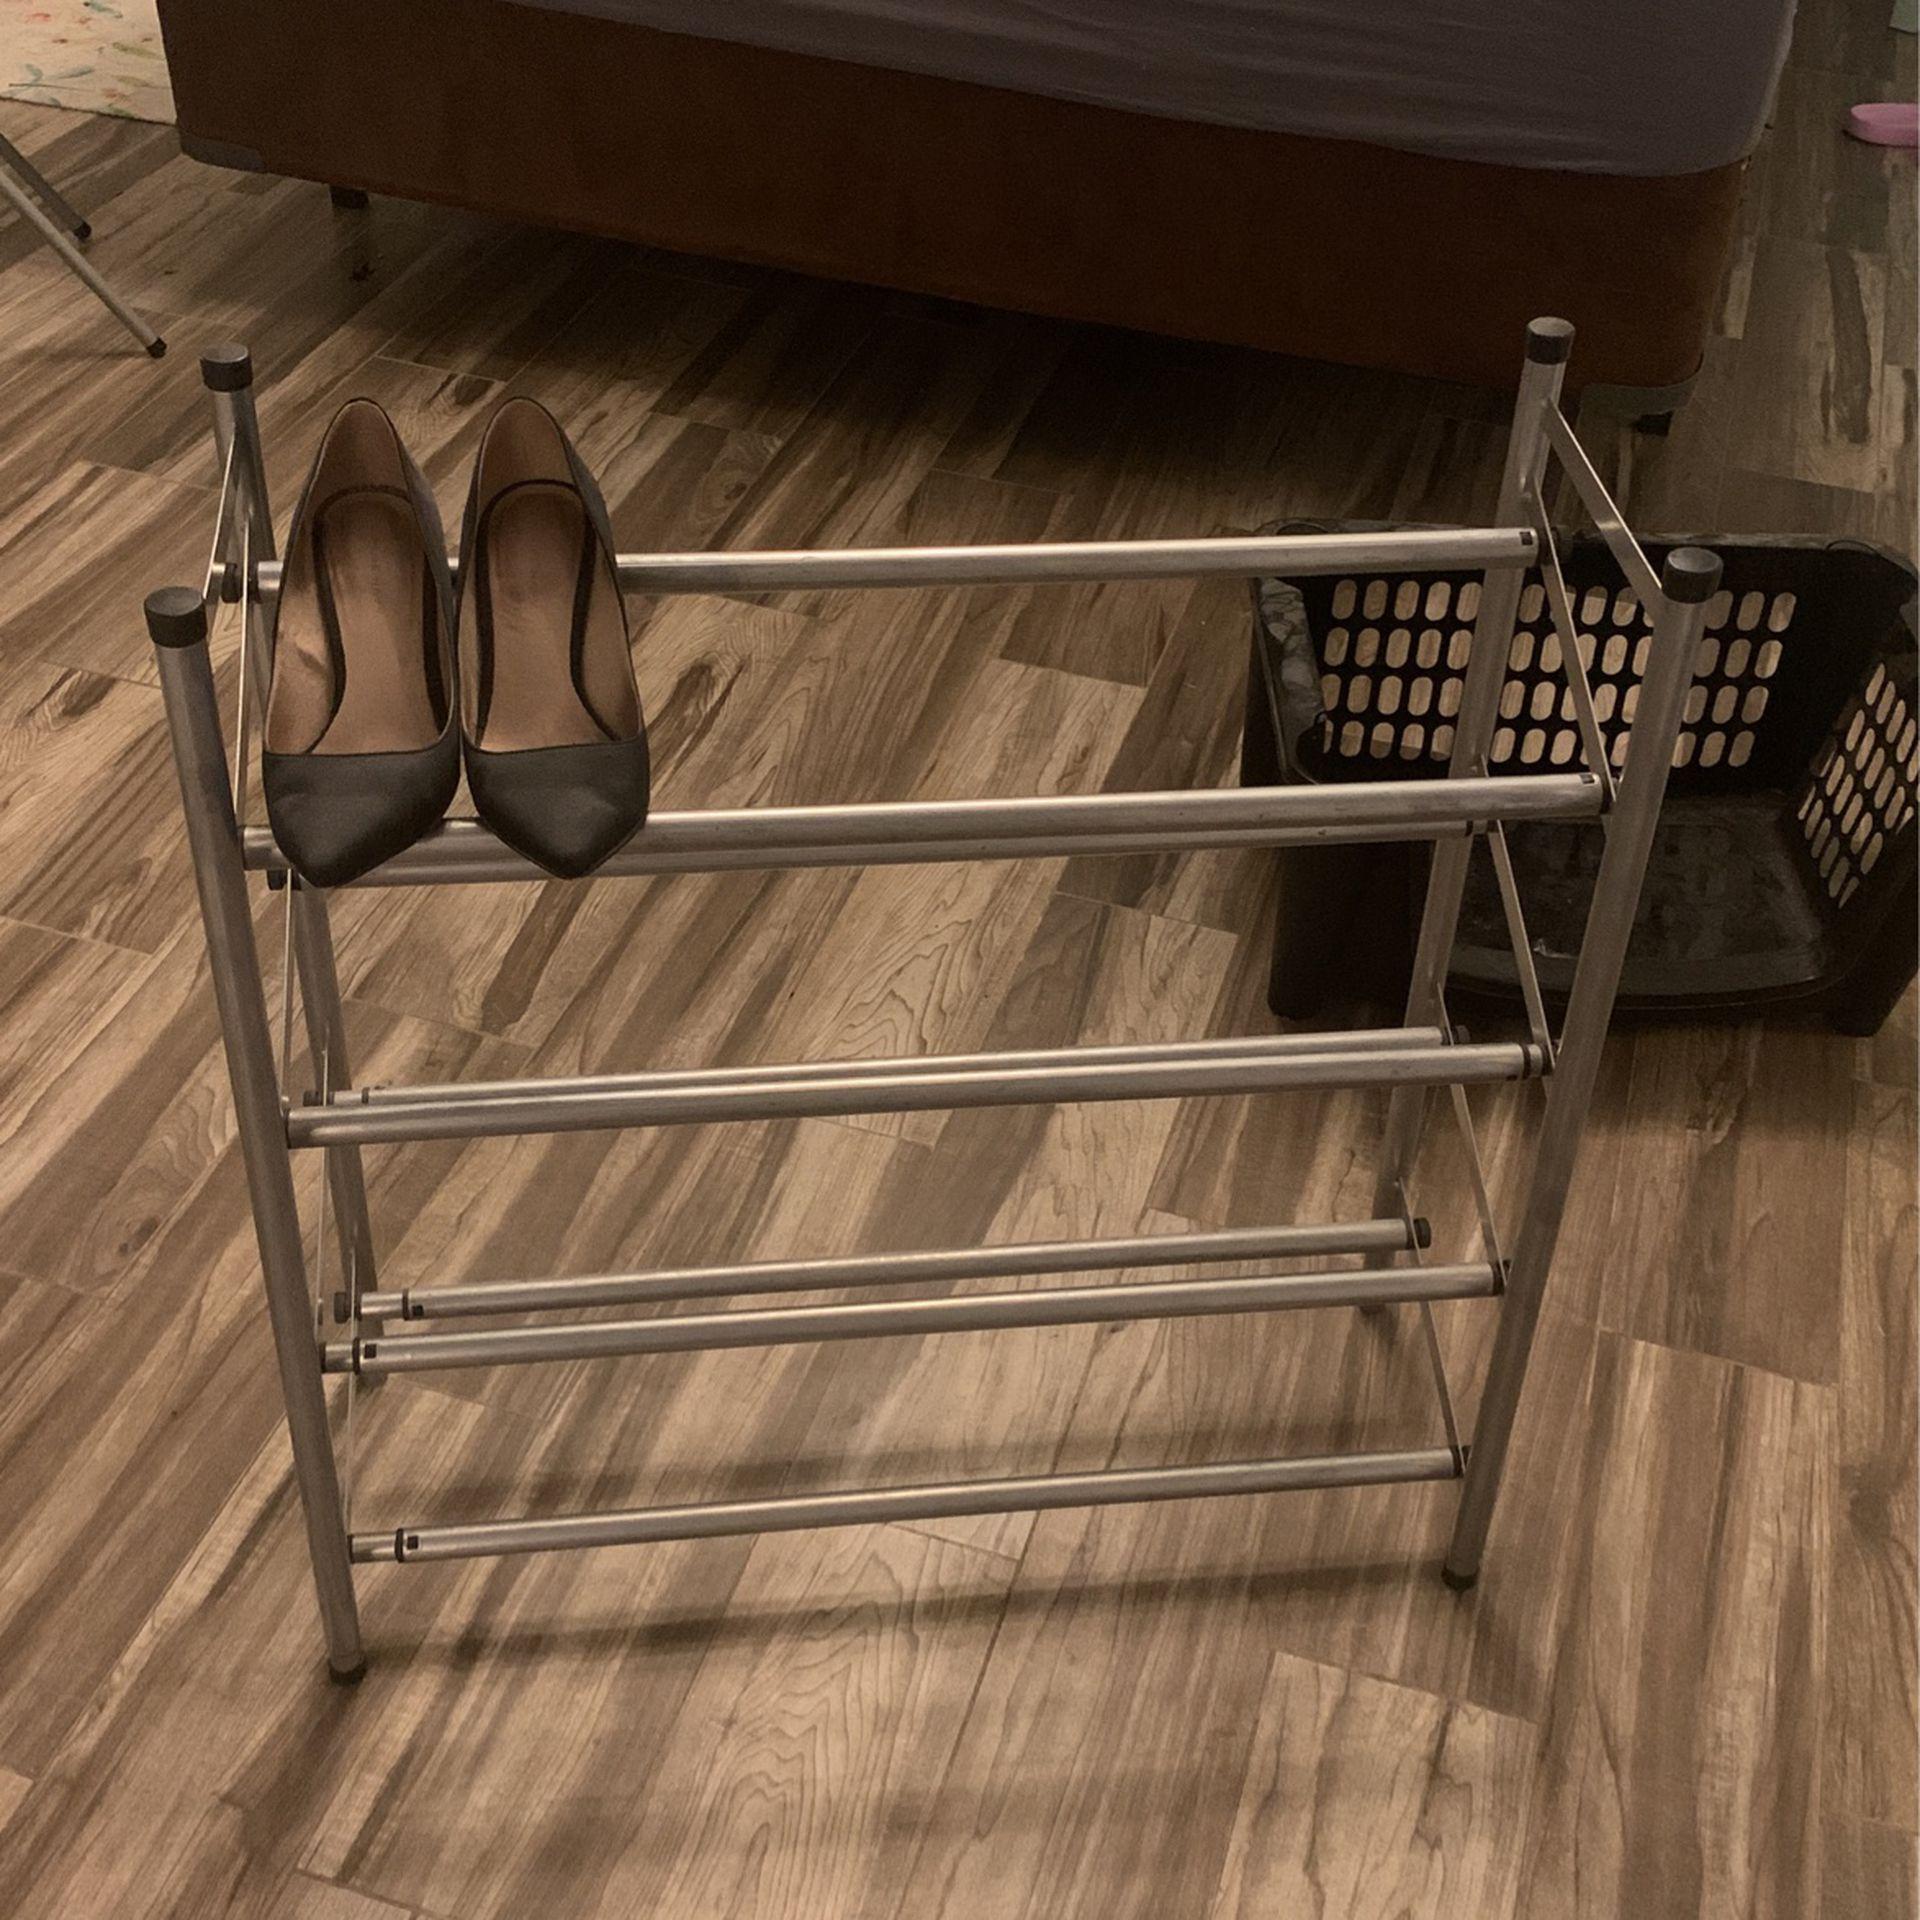 Adjustable Shoe Rack / Organizer